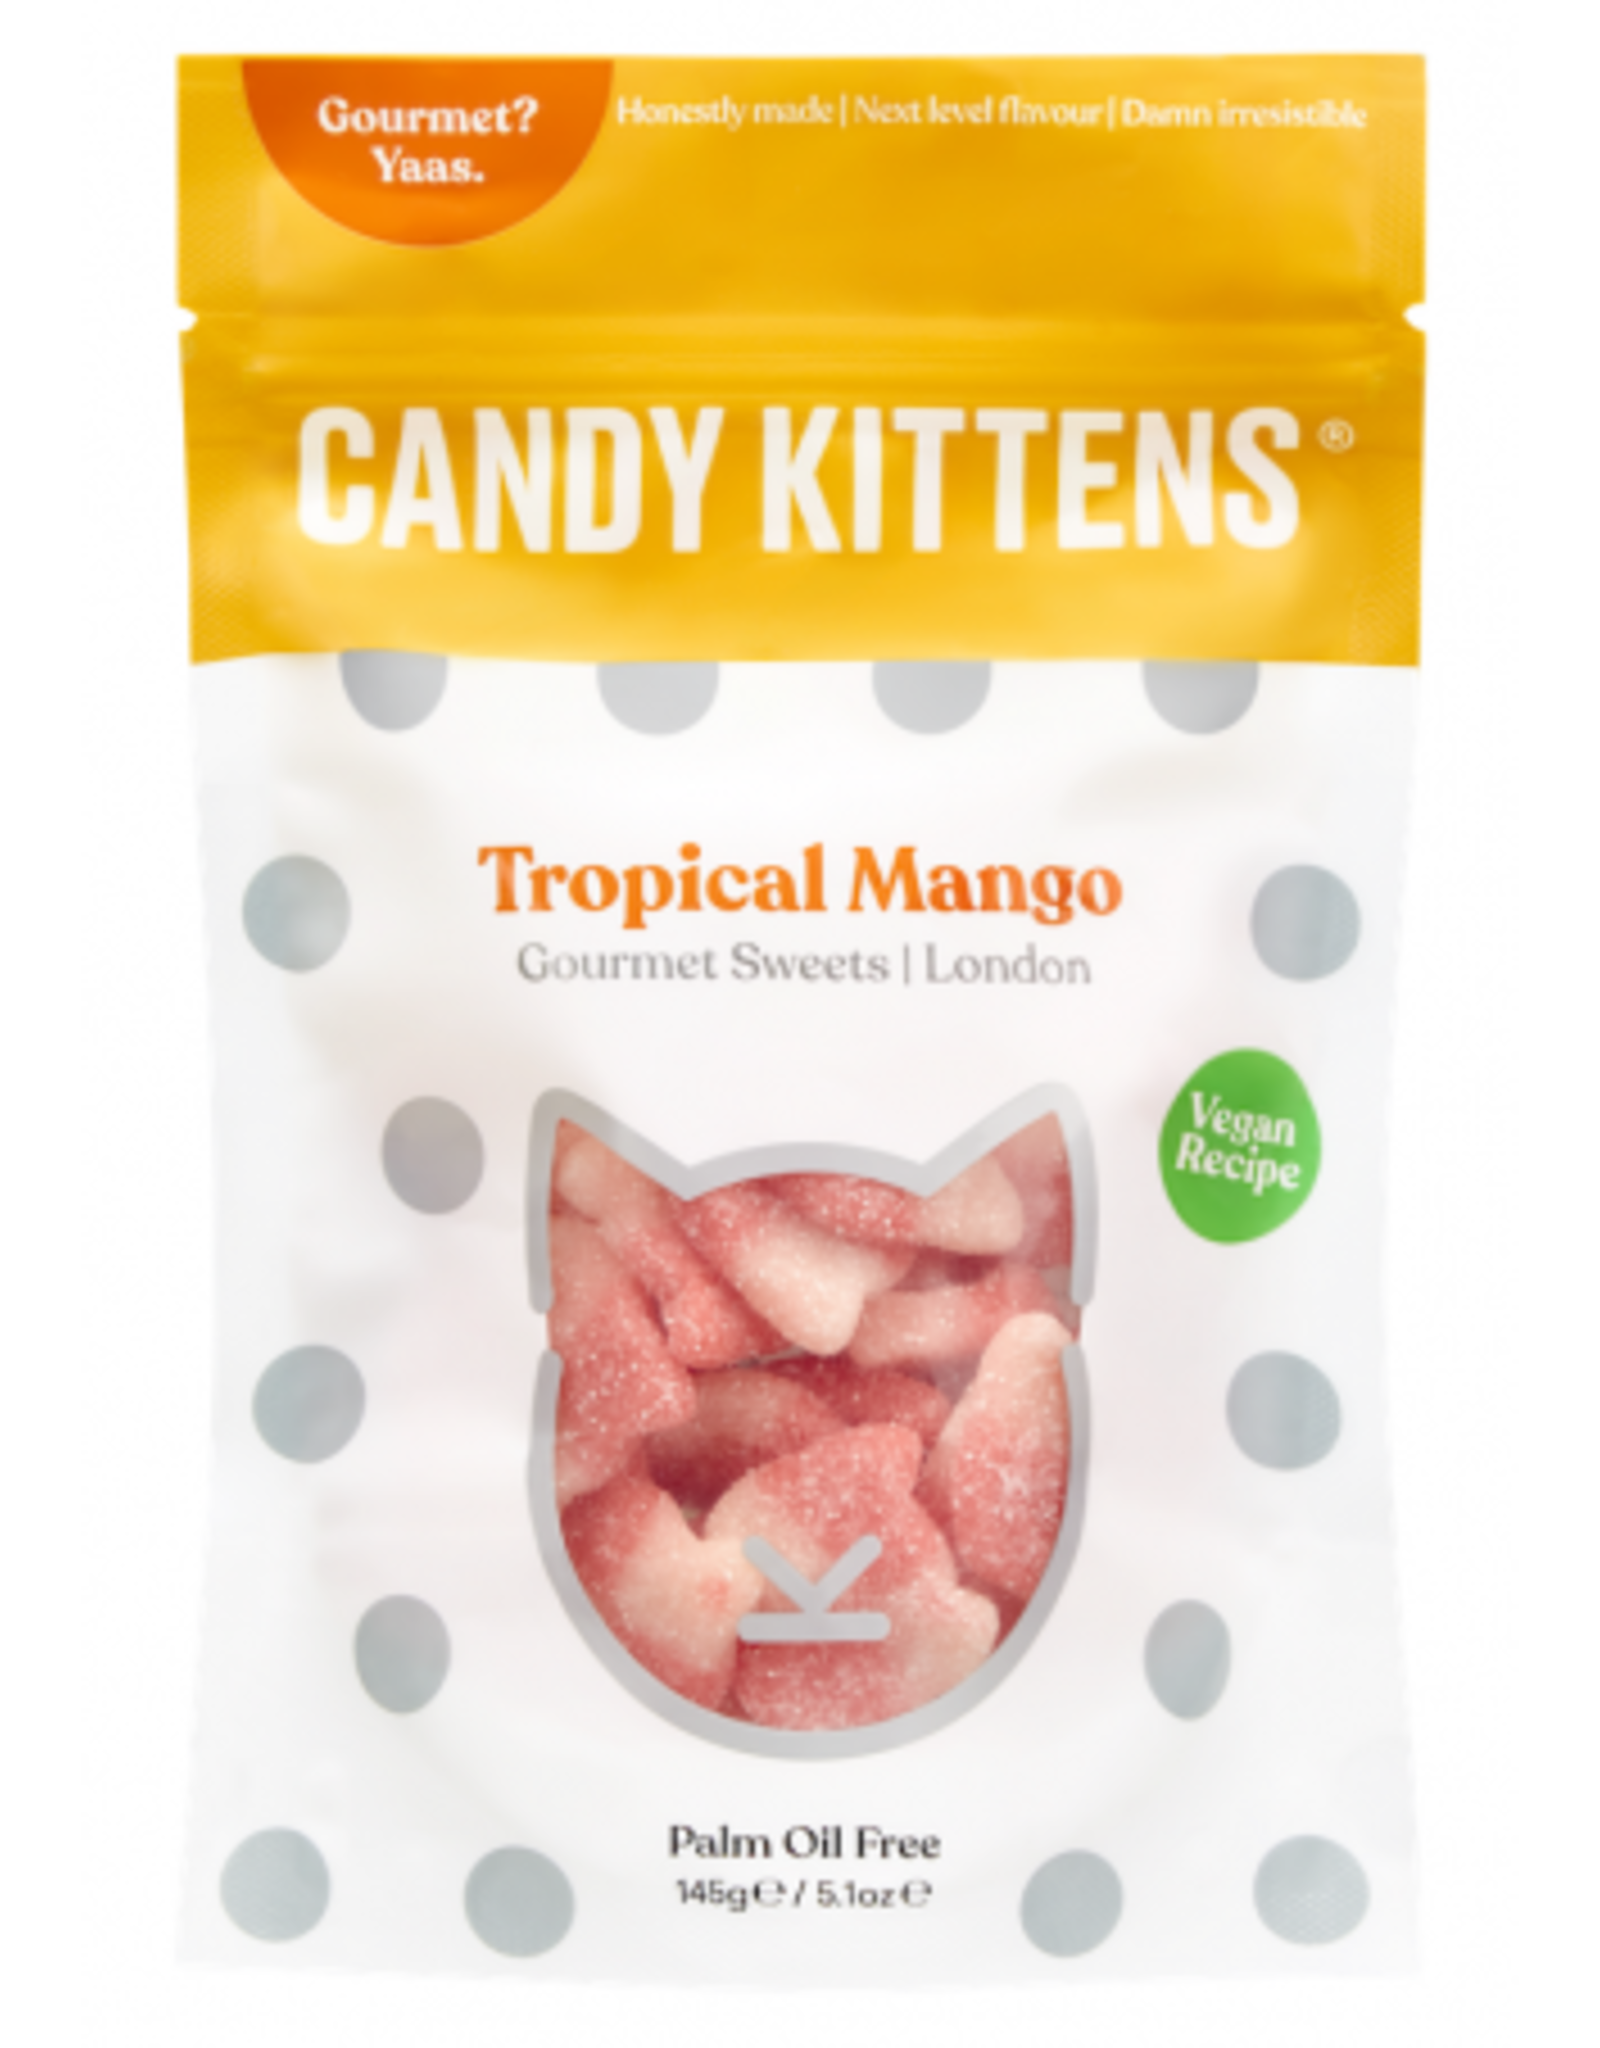 Candy Kittens Candy Kittens Tropical Mango 145g